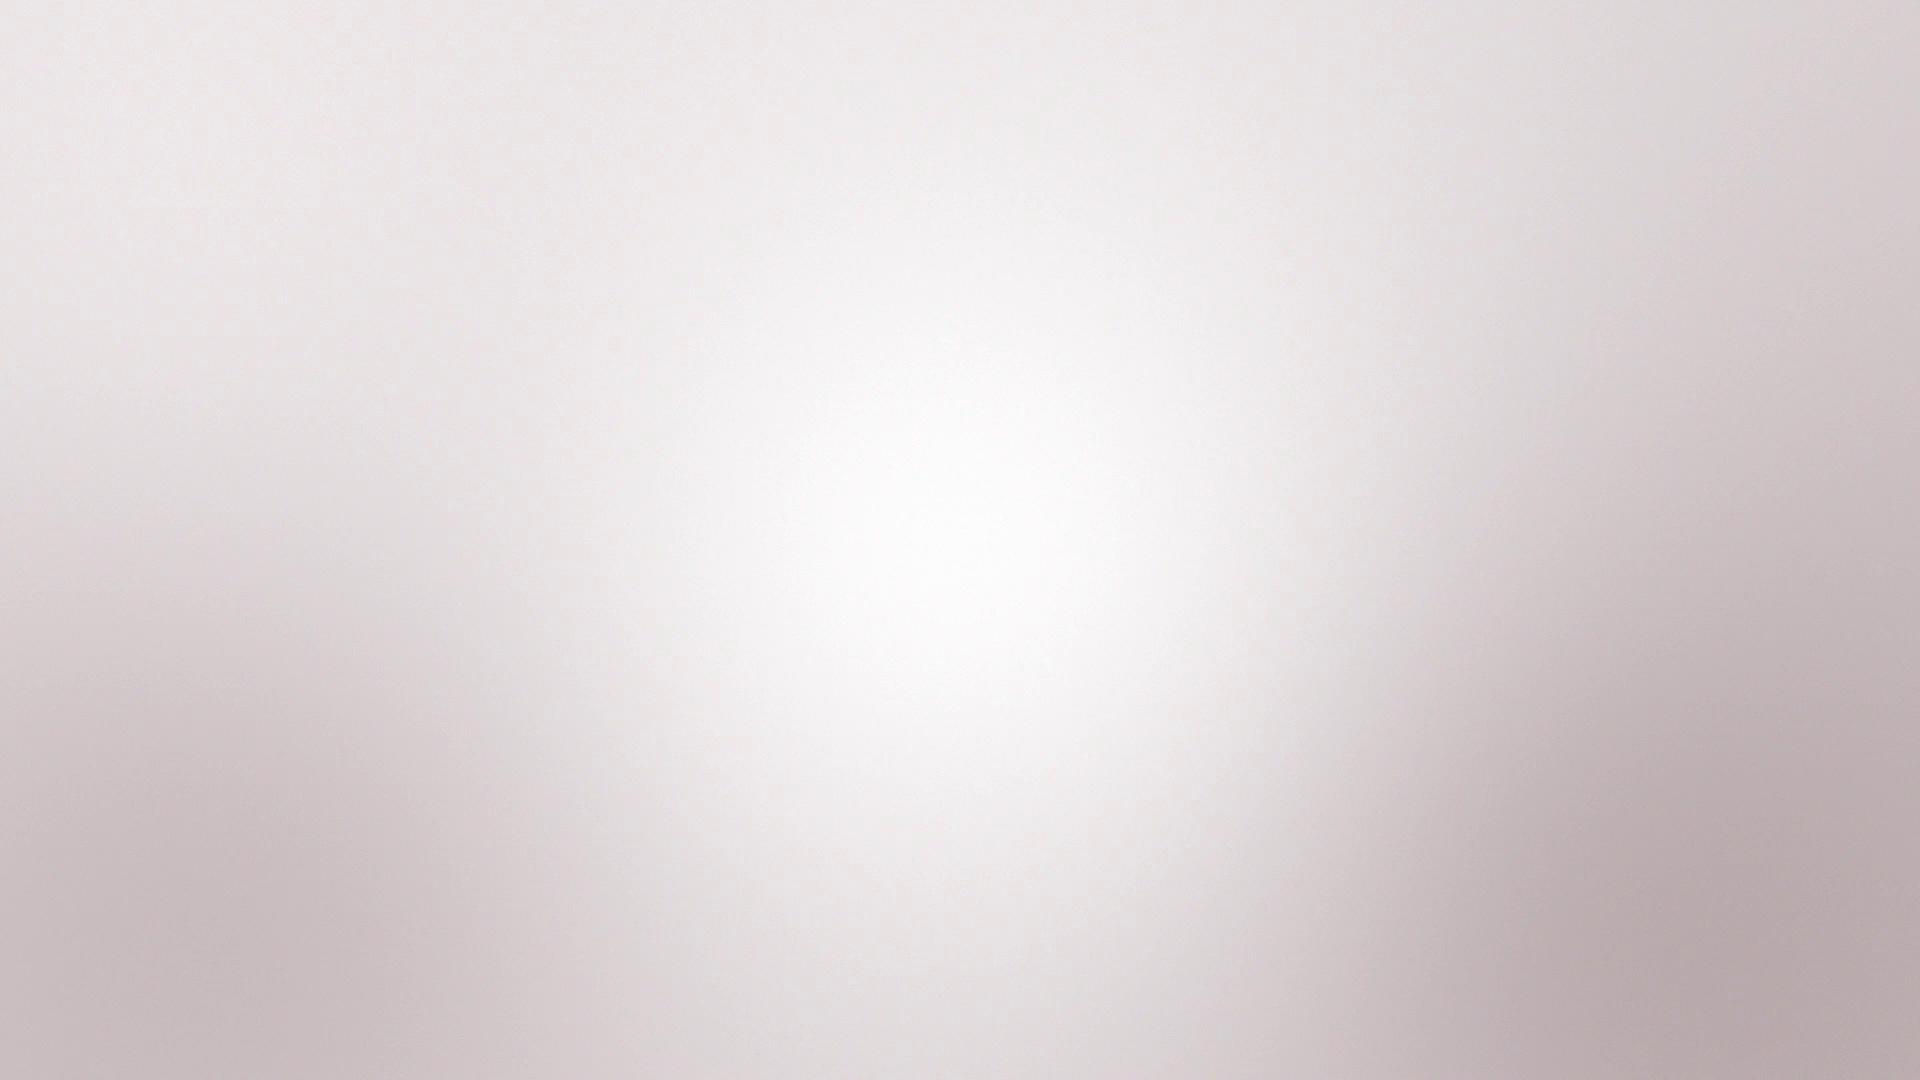 Westmark Spätzle-/Kartoffelpresse, Mit runder Lochung, Aluminiumdruckguss, Länge: 41 cm, Spätzlepress, Silber, 61102260